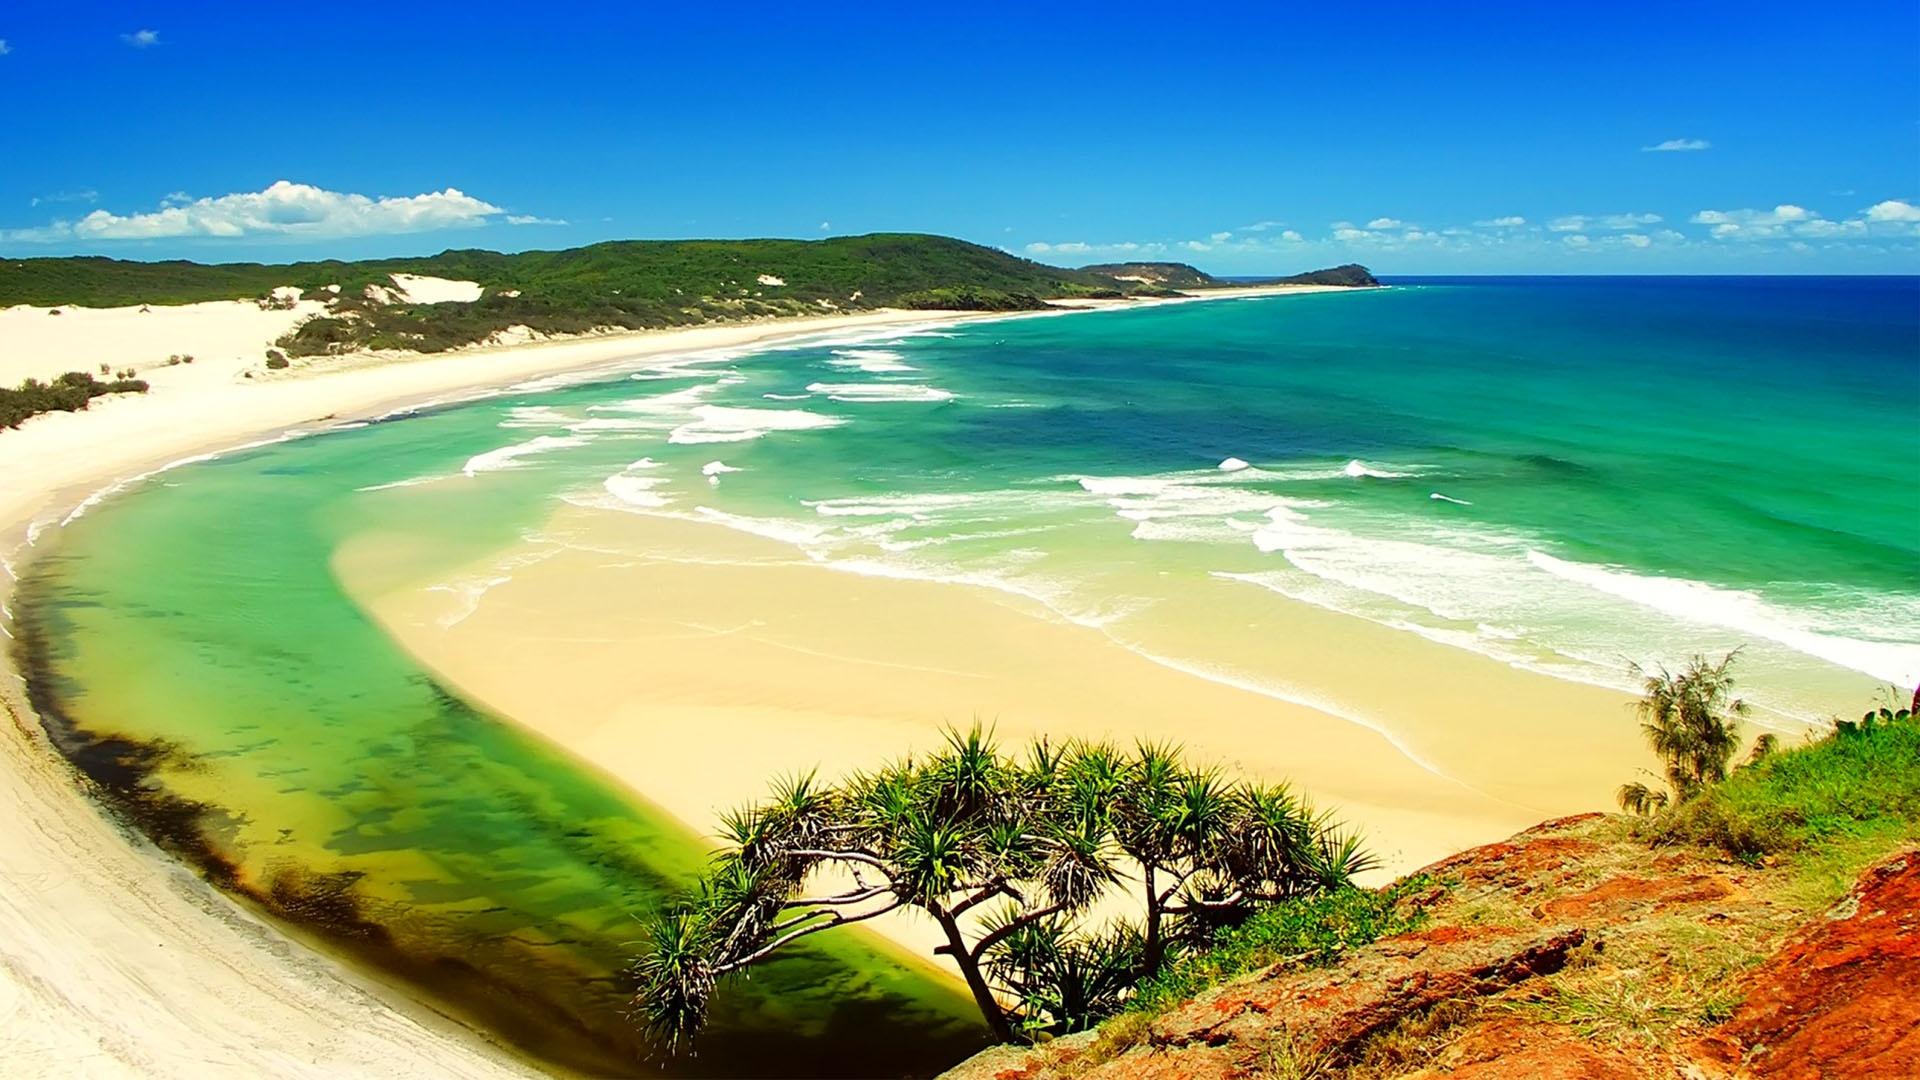 URL httpbigbackgroundcomsummersummer beach backgroundshtml 1920x1080